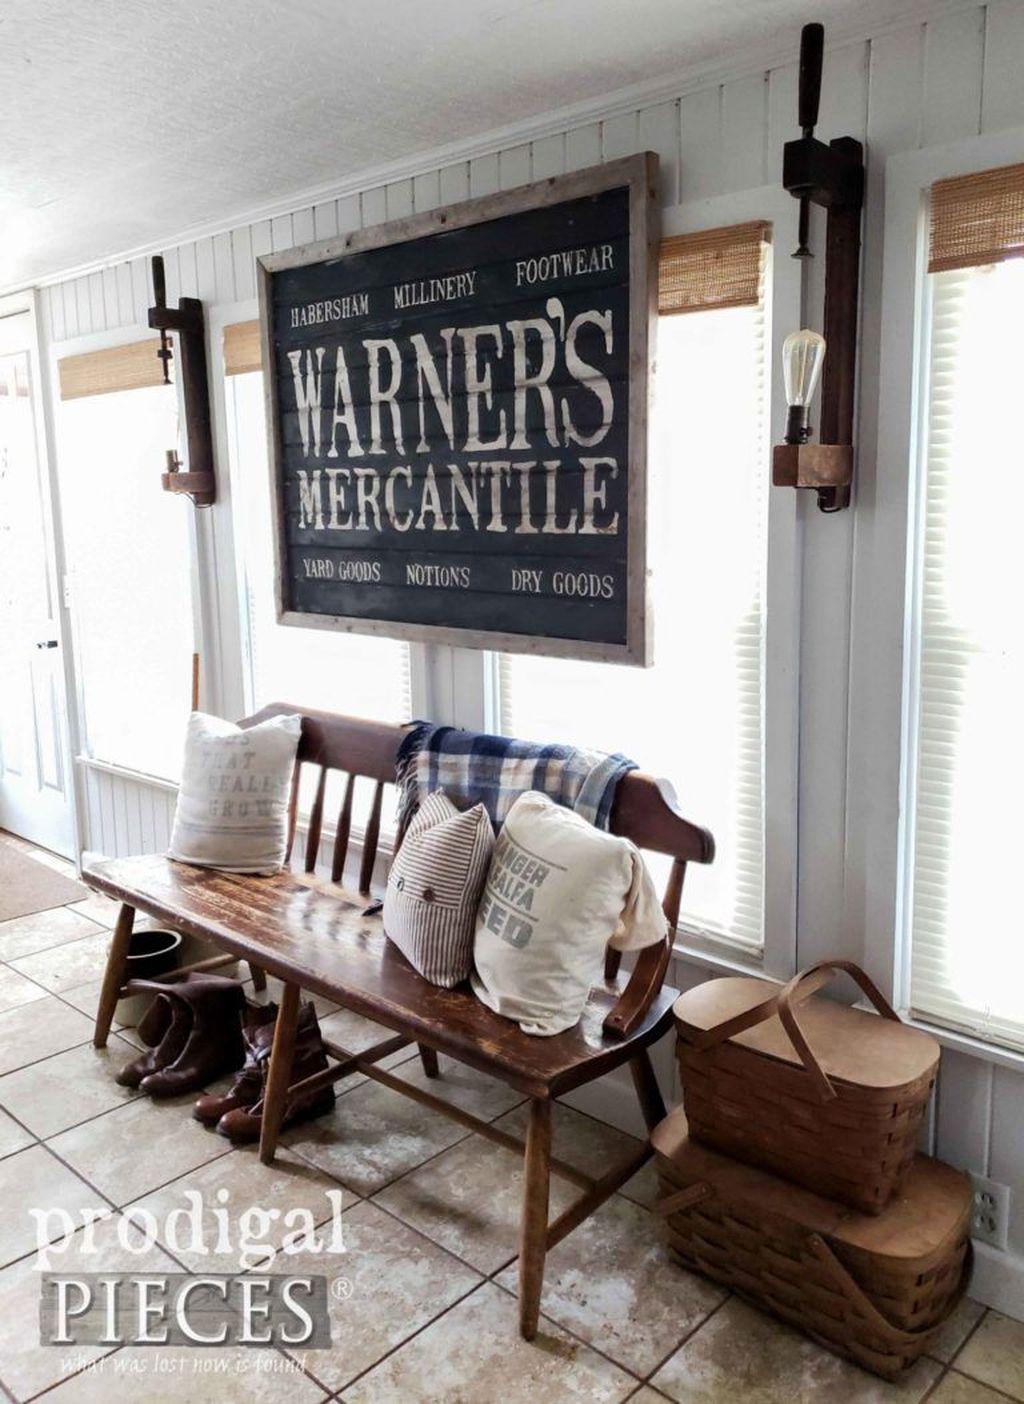 Superb Handmade Home Décor Ideas For Home Look Great 10